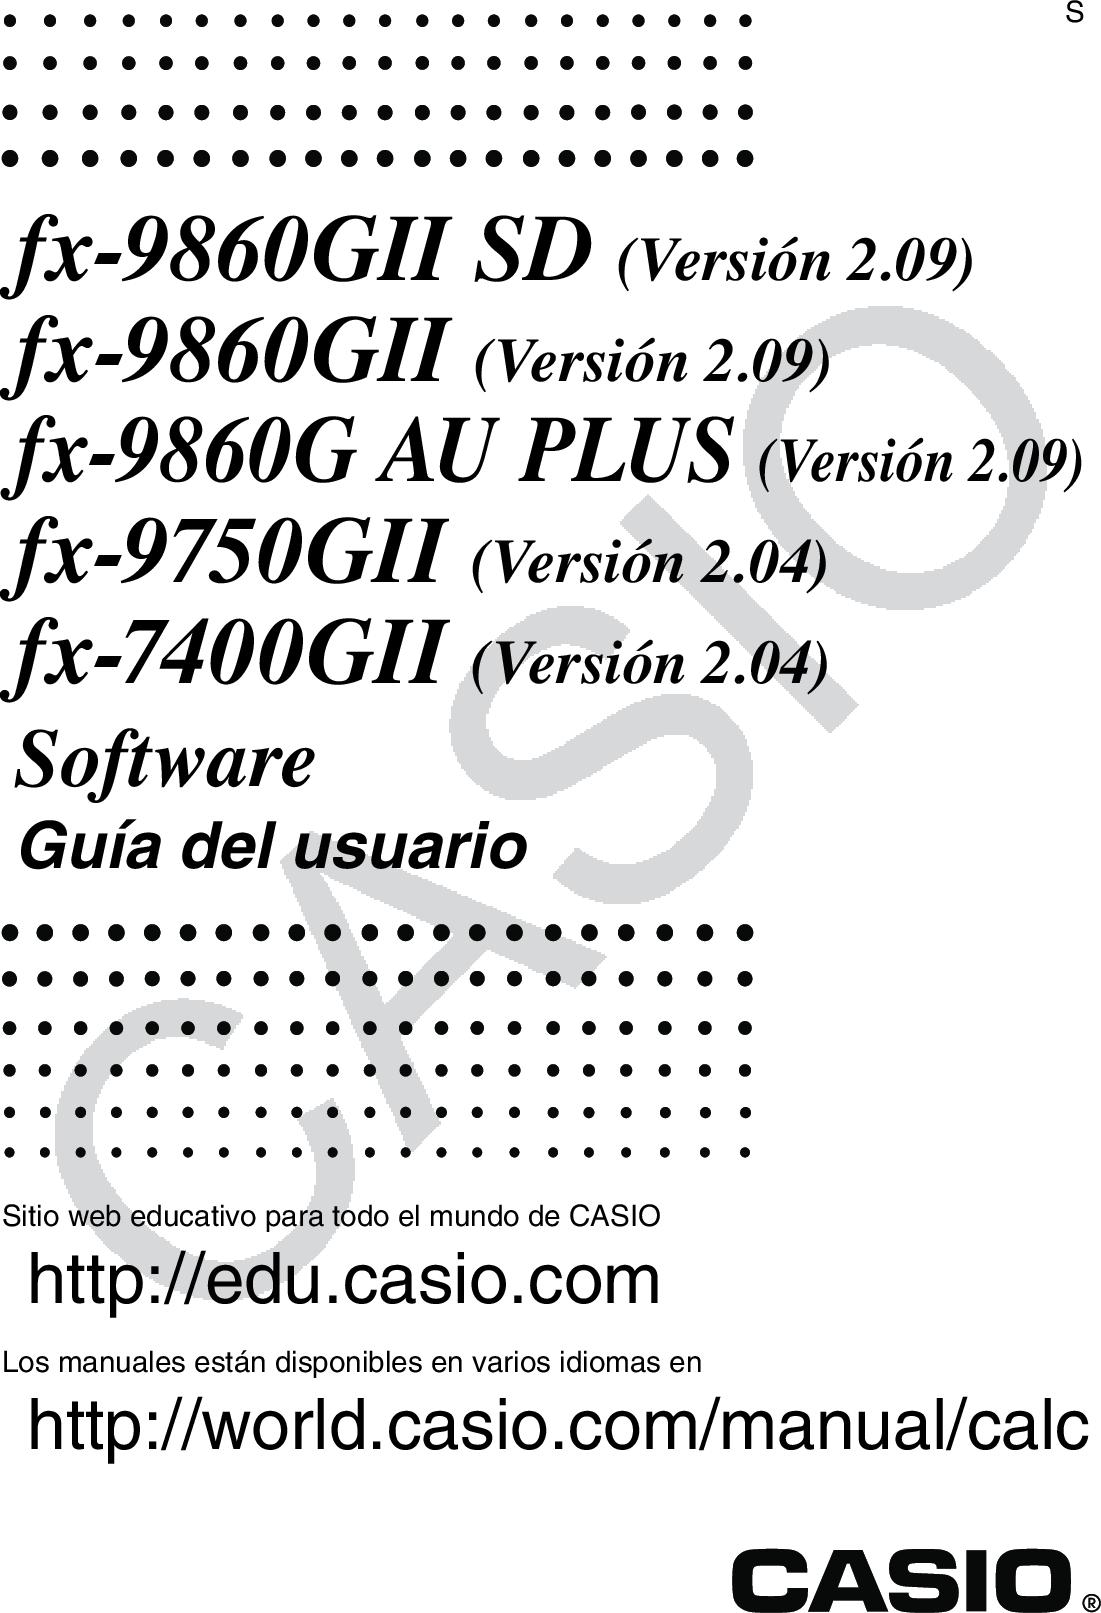 Casio Fx 9860GII SD_9860GII_9860G AU PLUS_9750GII_7400GII